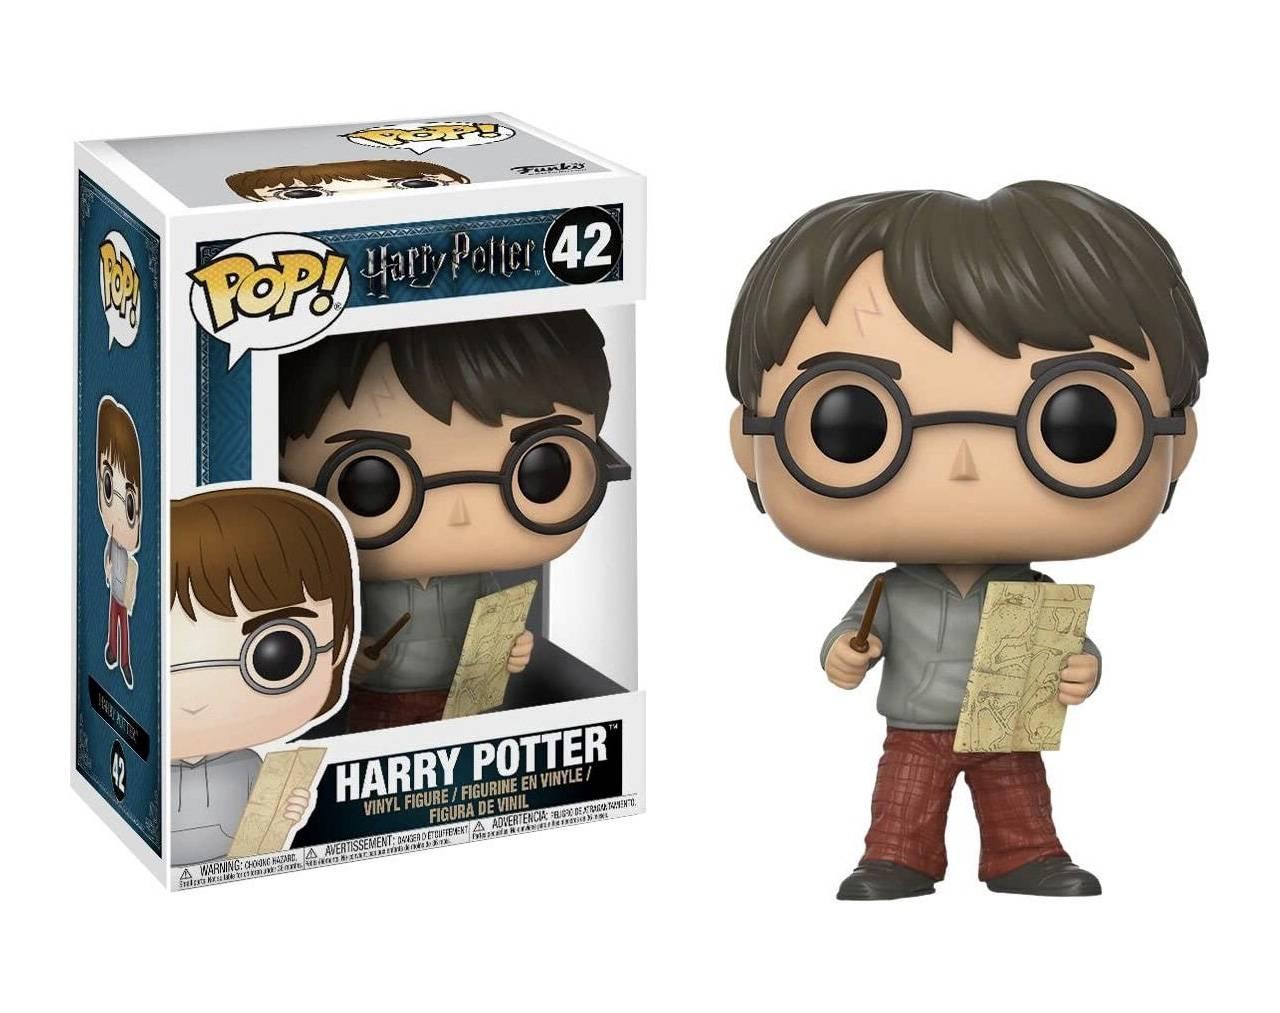 Harry Potter (Marauder's Map) Pop! Vinyl